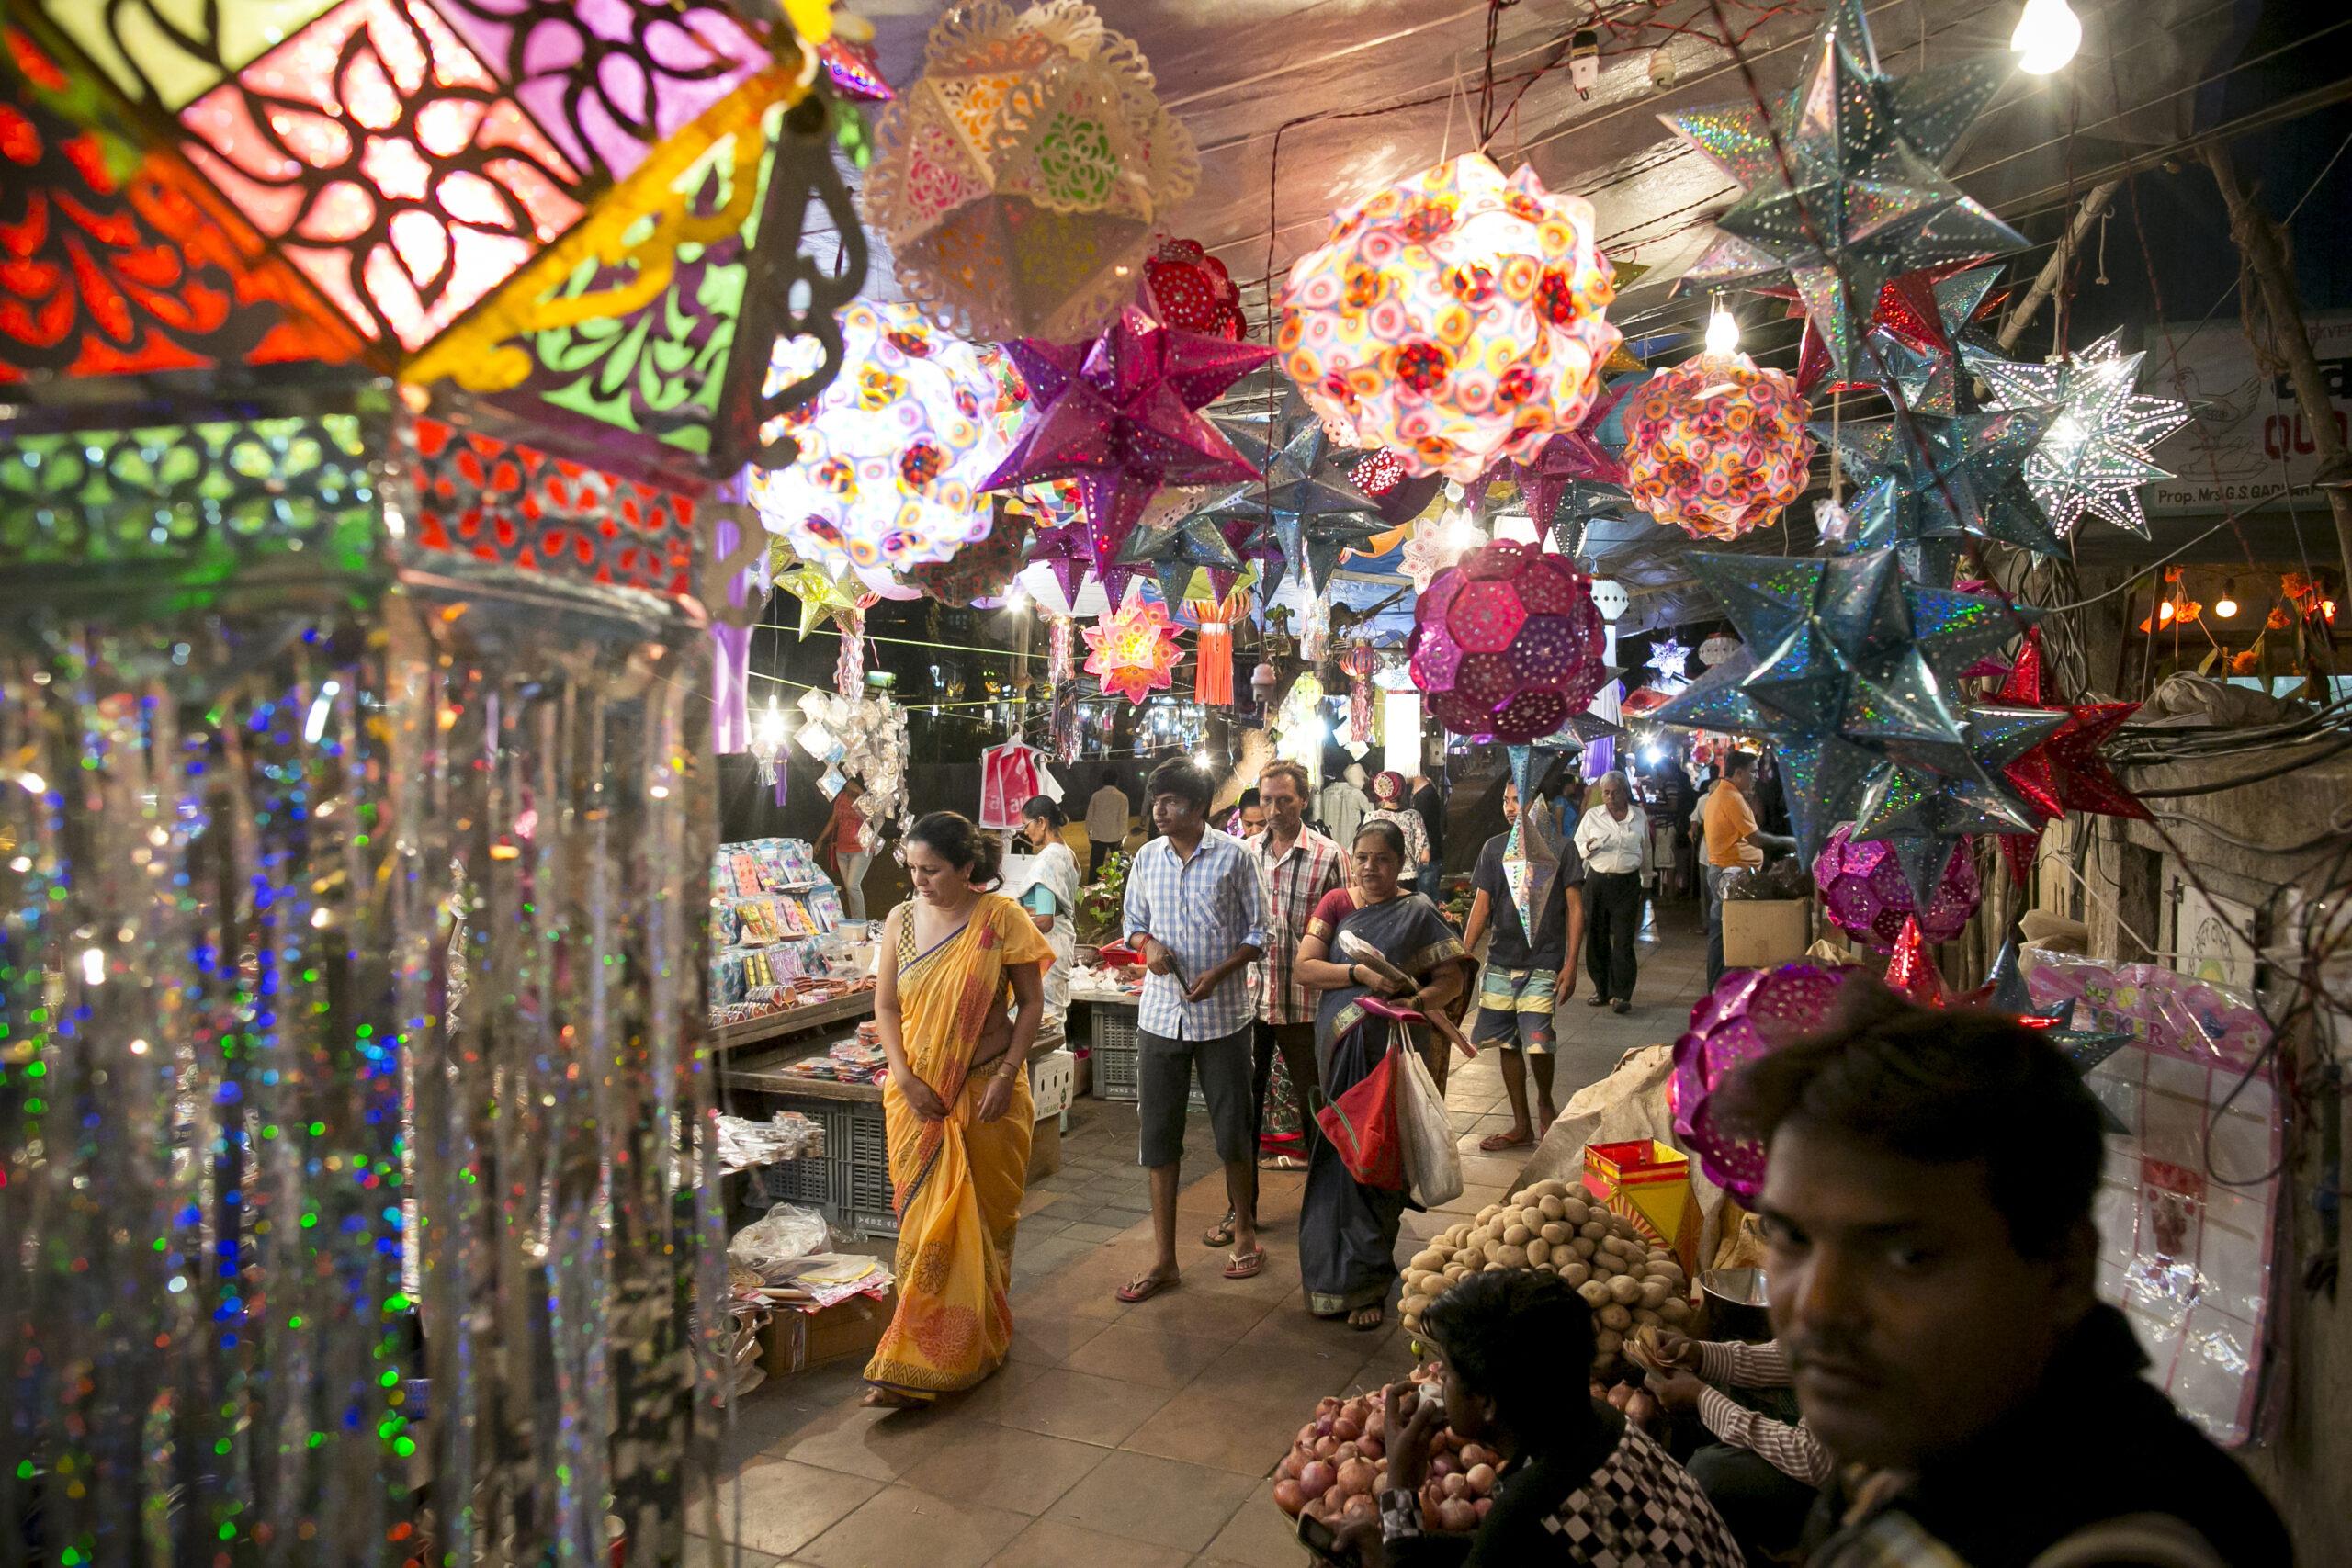 Covid-19 Cases Soar in India's Capital Ahead of Diwali Festival